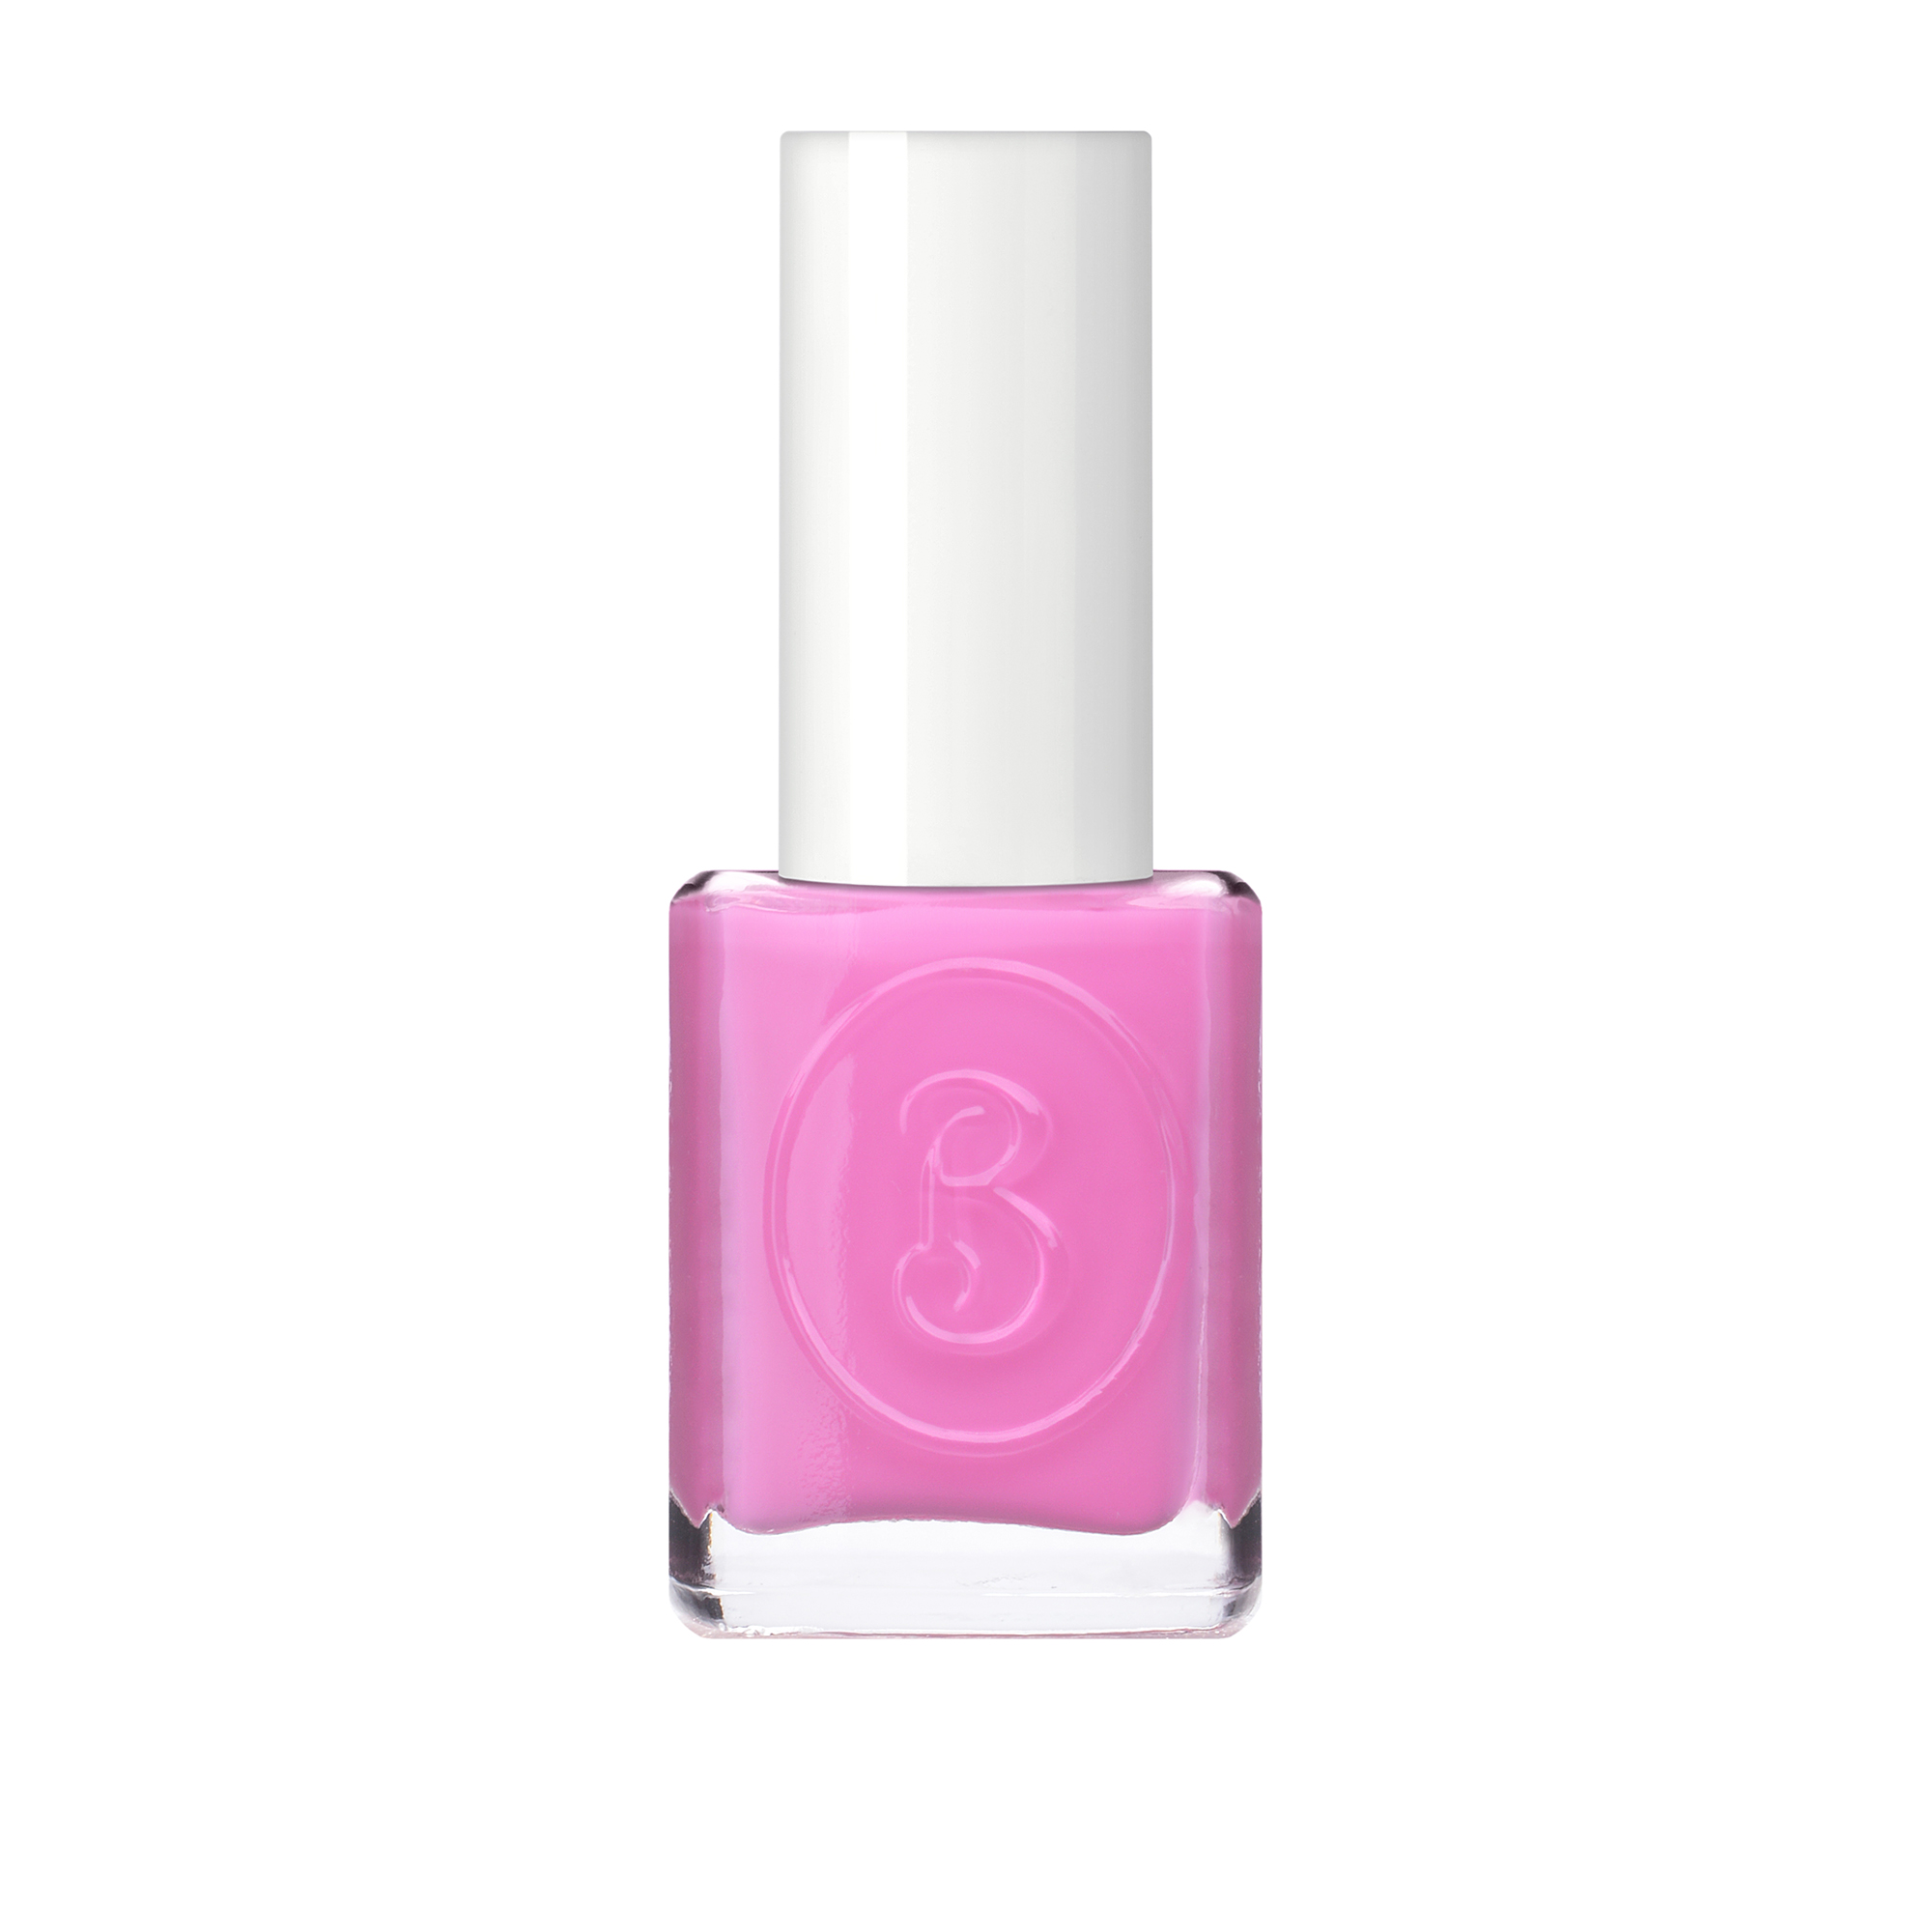 BERENICE 16 лак для ногтей, светло розовый / Light pink 16 мл berenice 53 лак для ногтей рыжая лиса red fox 16 мл